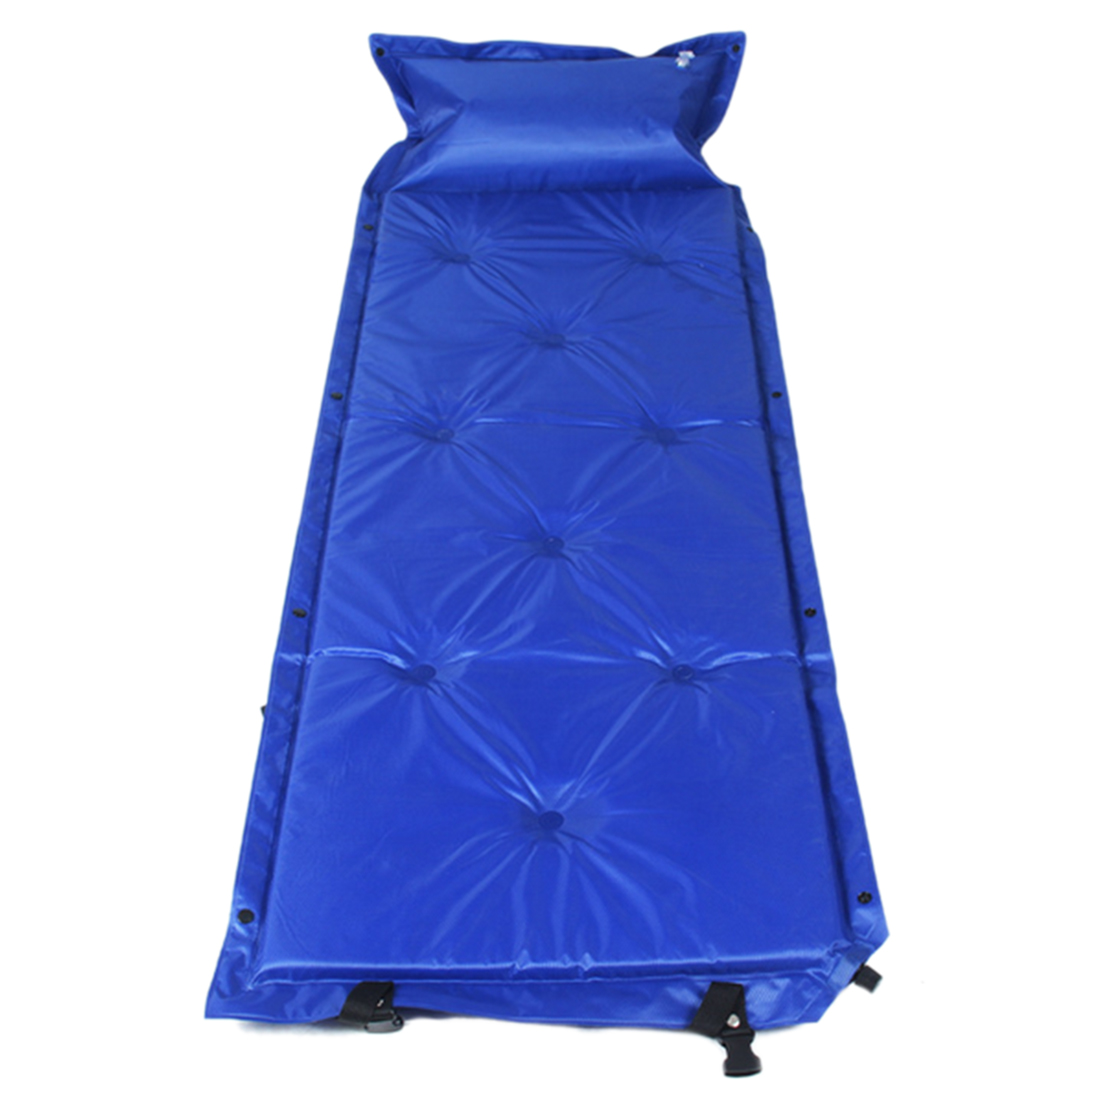 Floor mats to sleep on - Automatic Inflatable Mat Cushion Single Sleeping Mat Camping Sleeping Picnic Mattress Pad With Pillow China